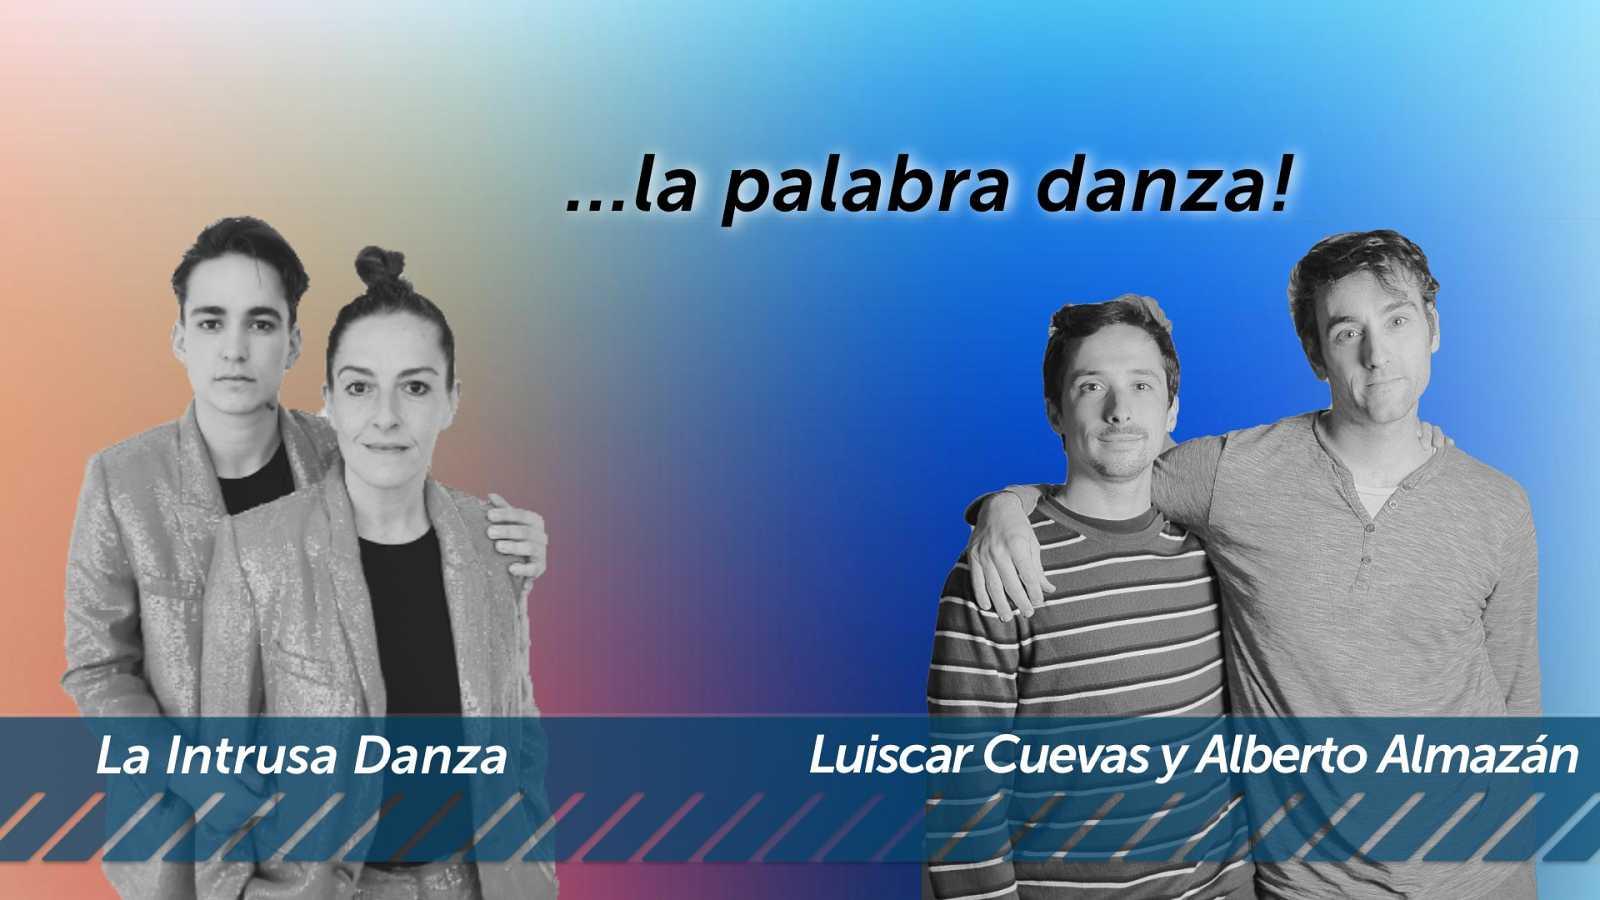 Buzón de baile - EMPATÍA - RADIANTE - 01/04/21 - ver ahora